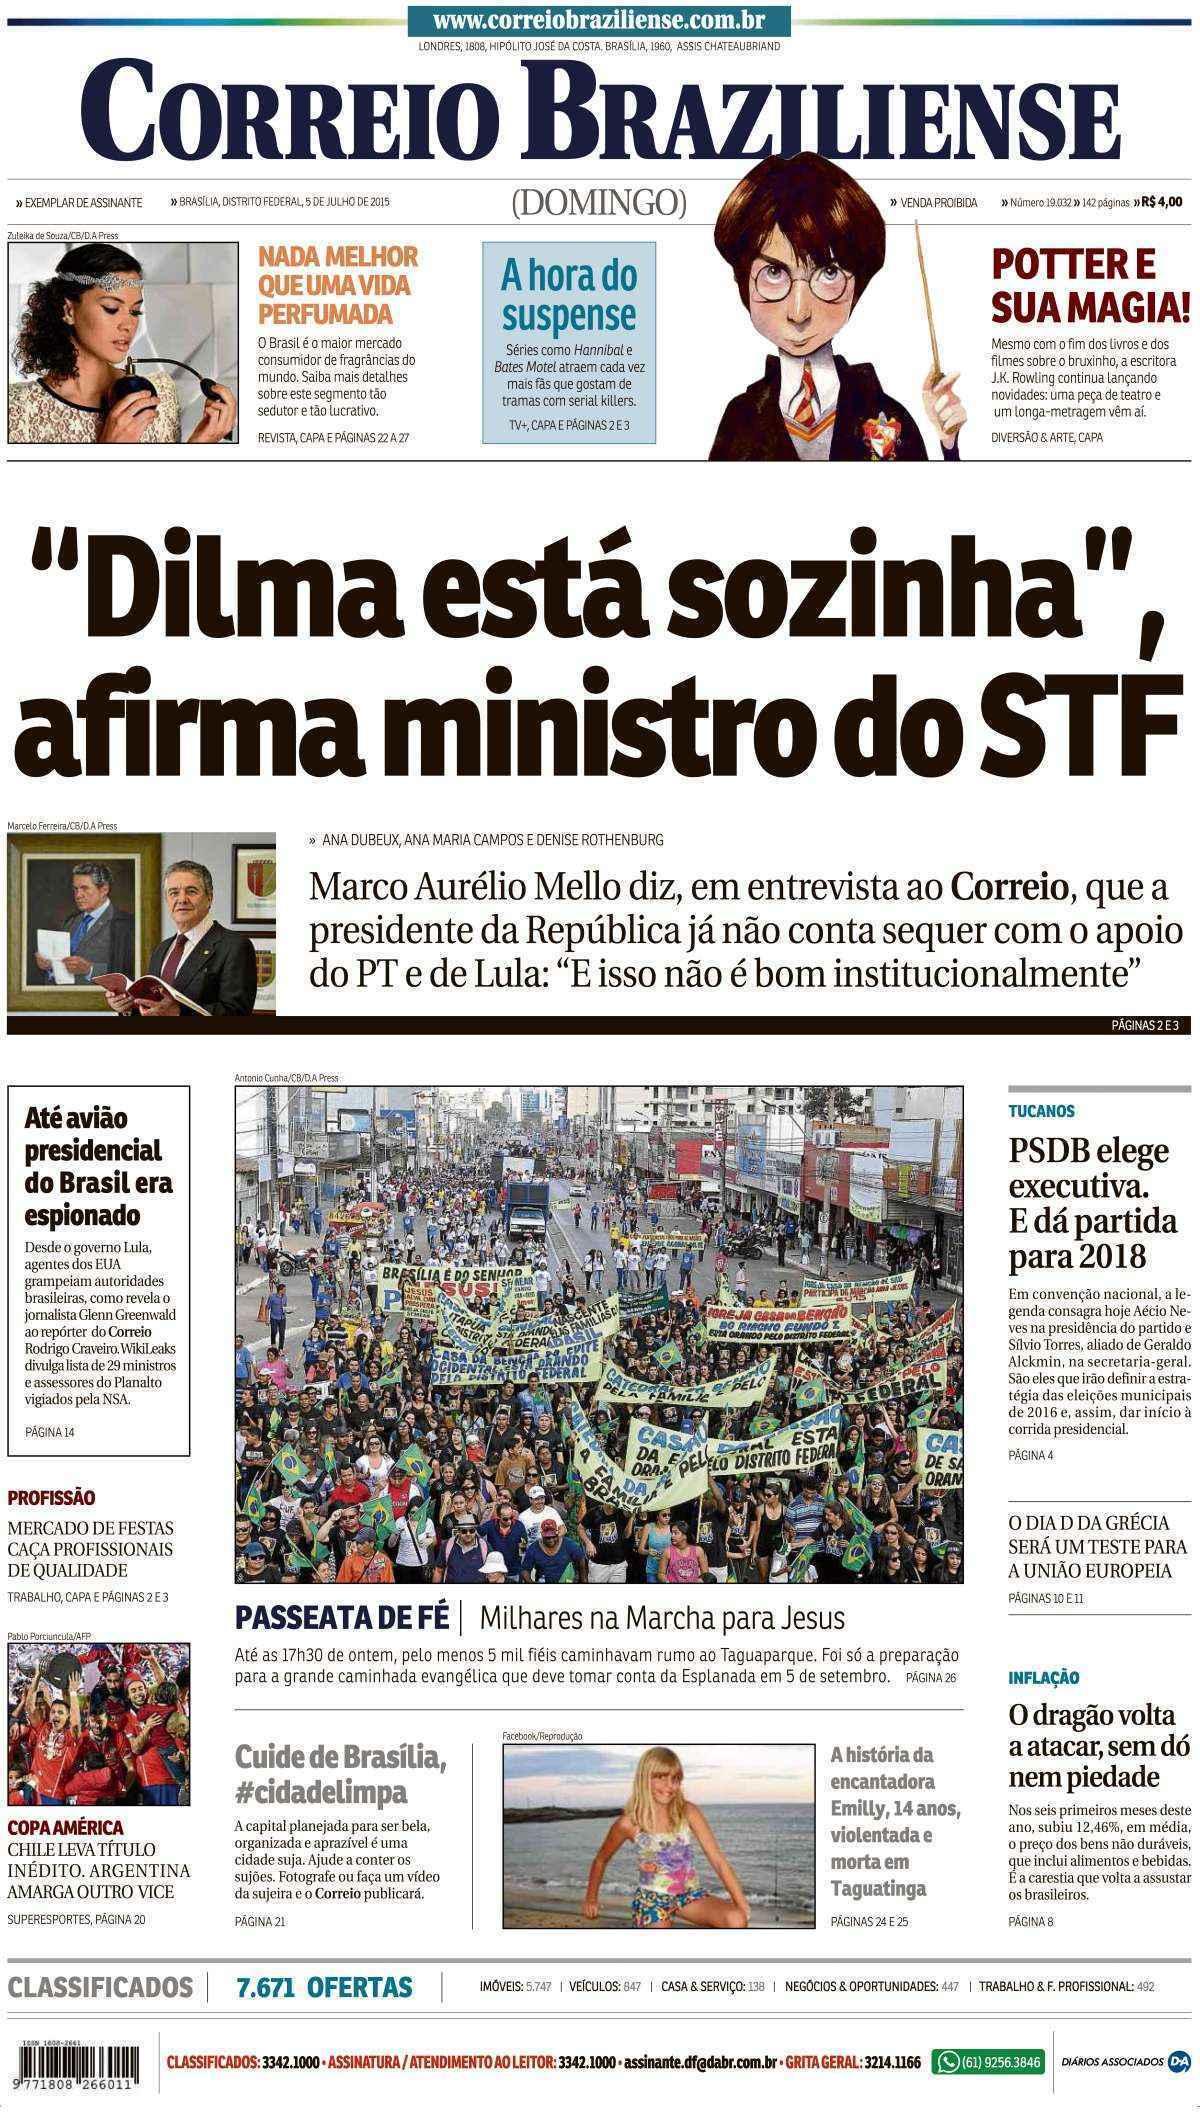 Correio Braziliense, 05 de Julho de 2015